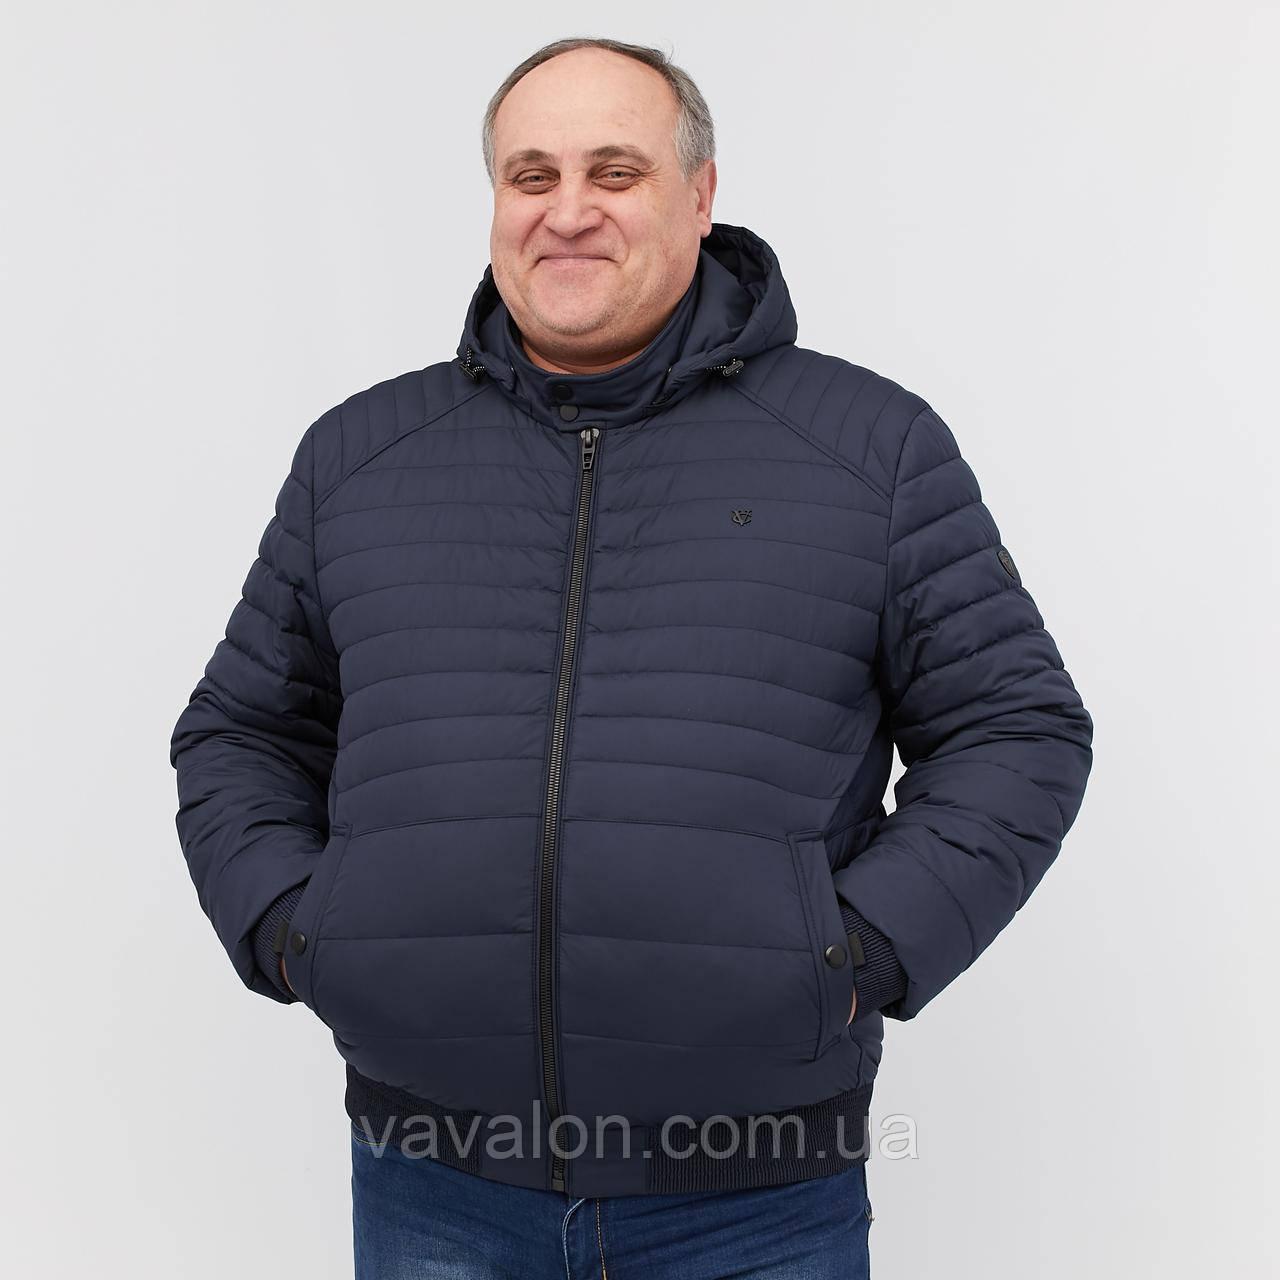 Куртка демисезонная под резинку Vavalon KD-B193 navy